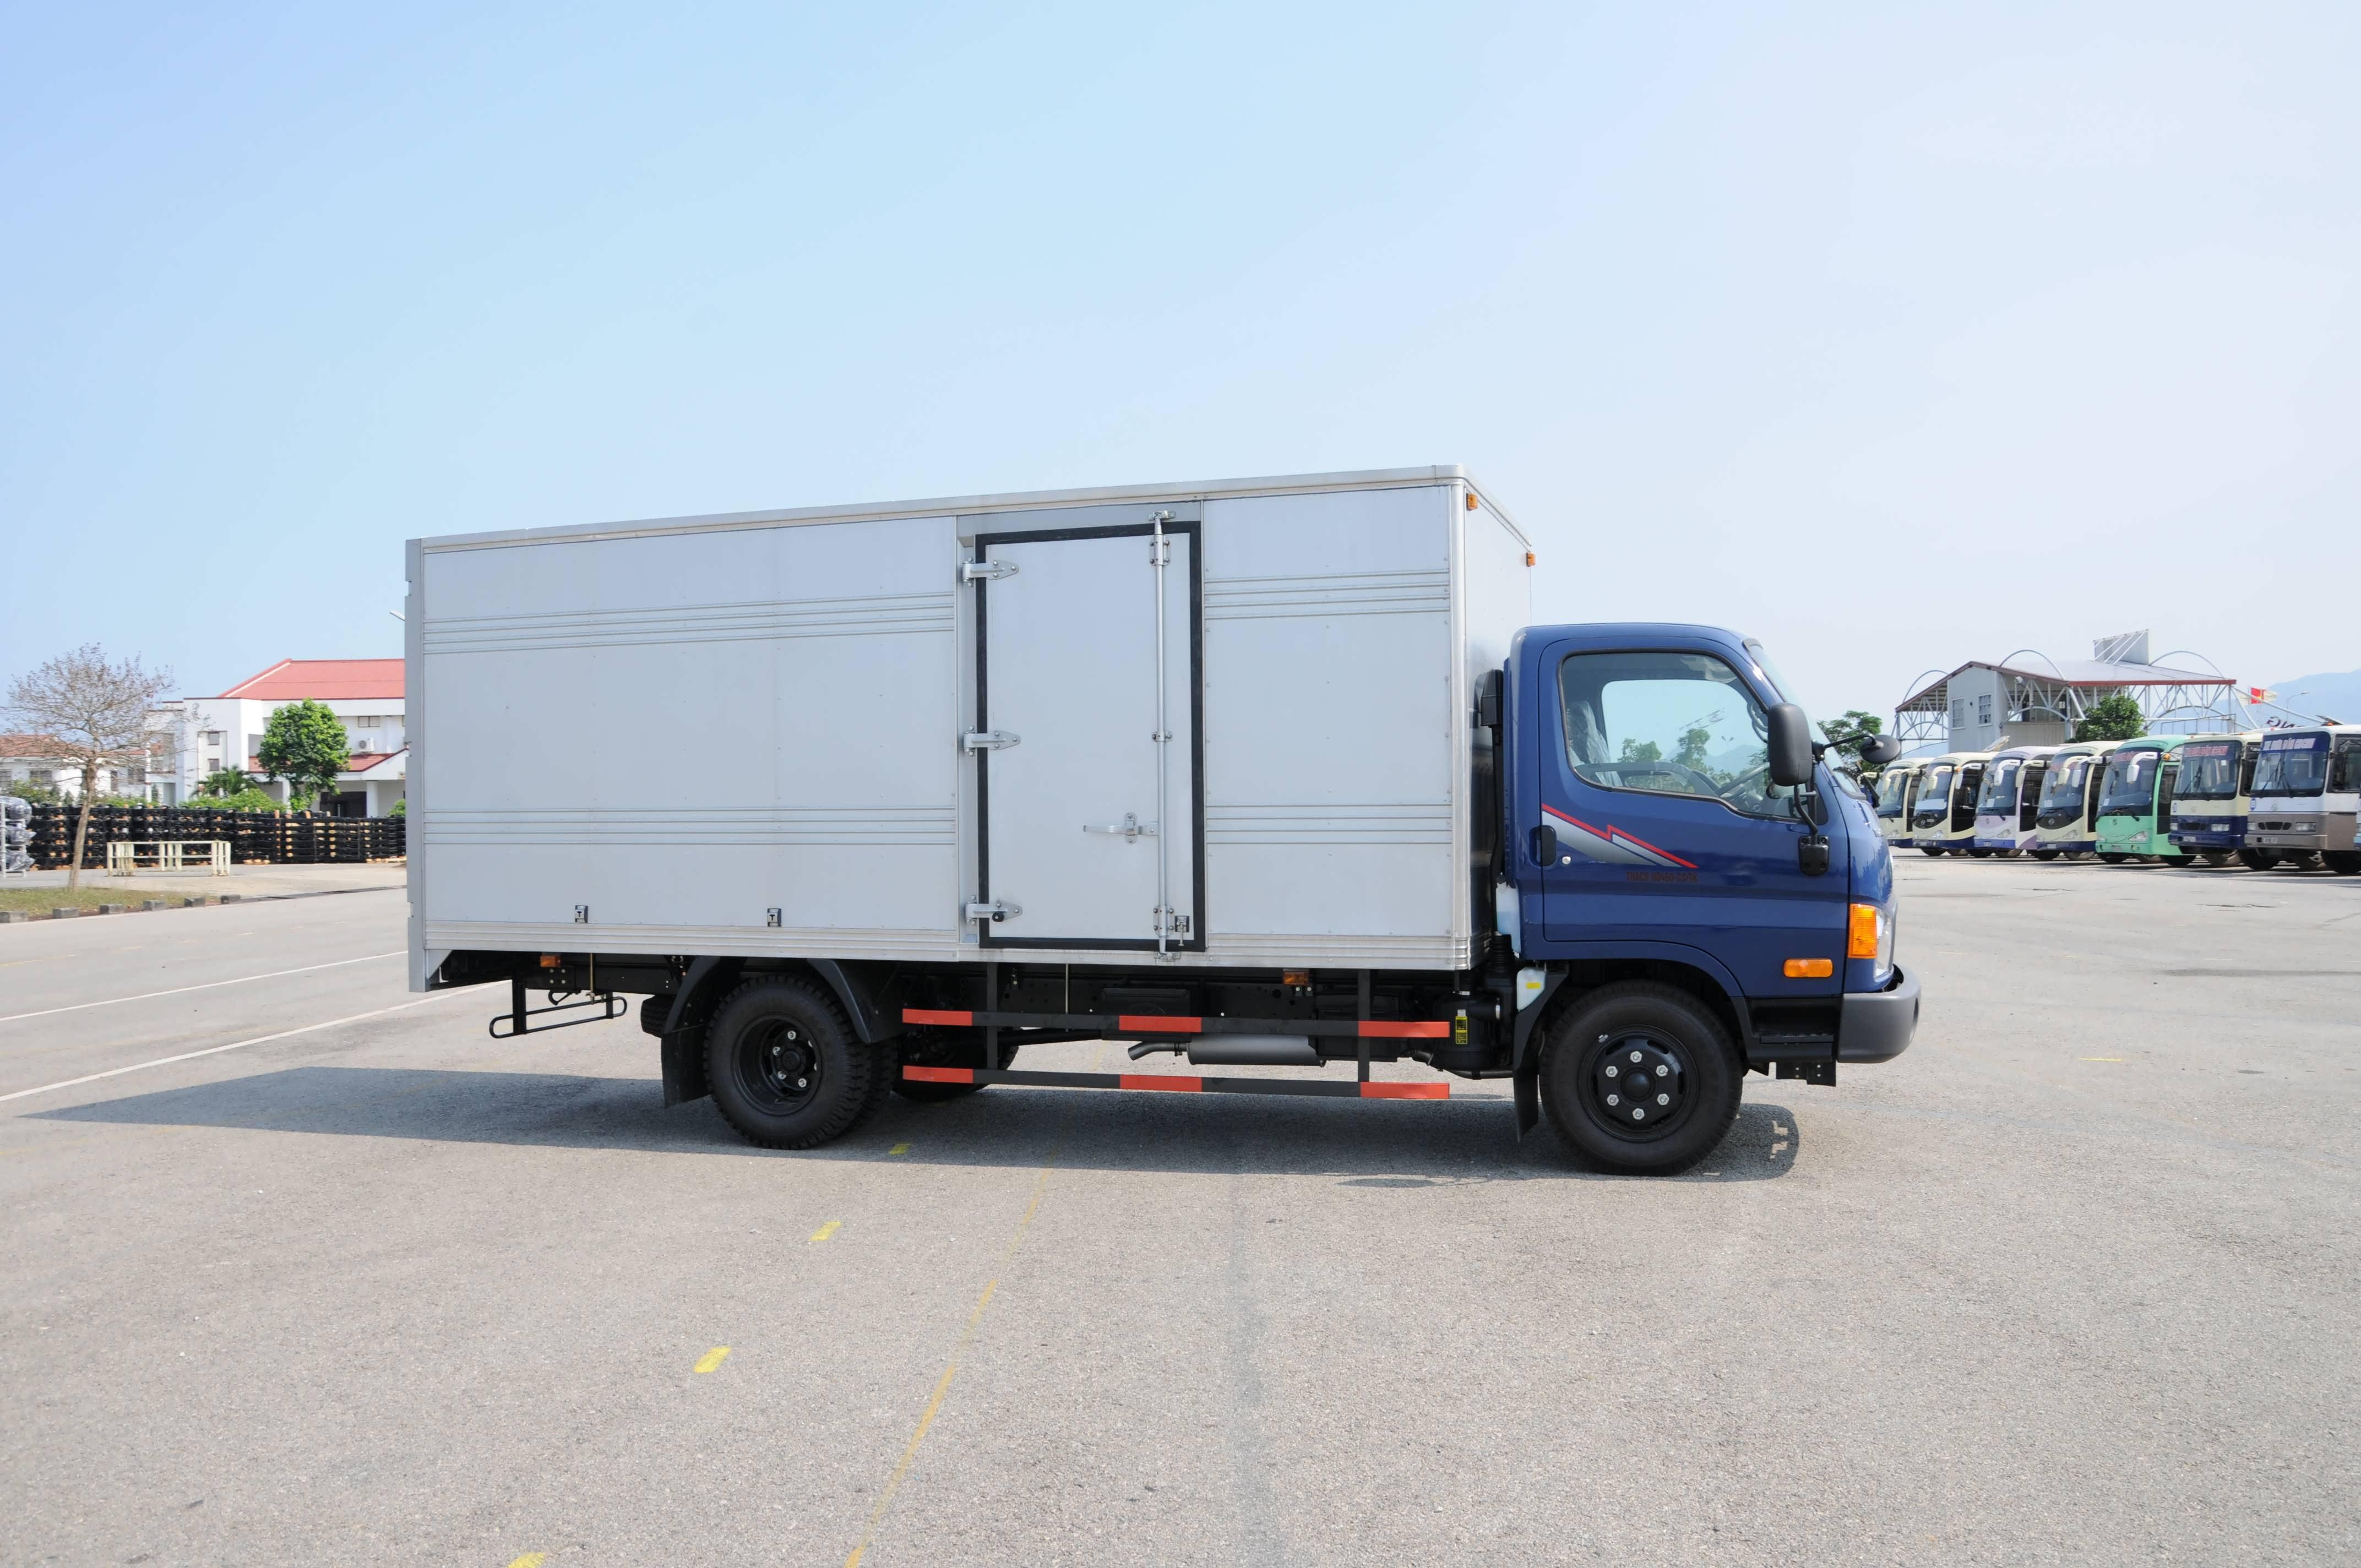 Xe tải Hyundai HD450 3,8 tấn